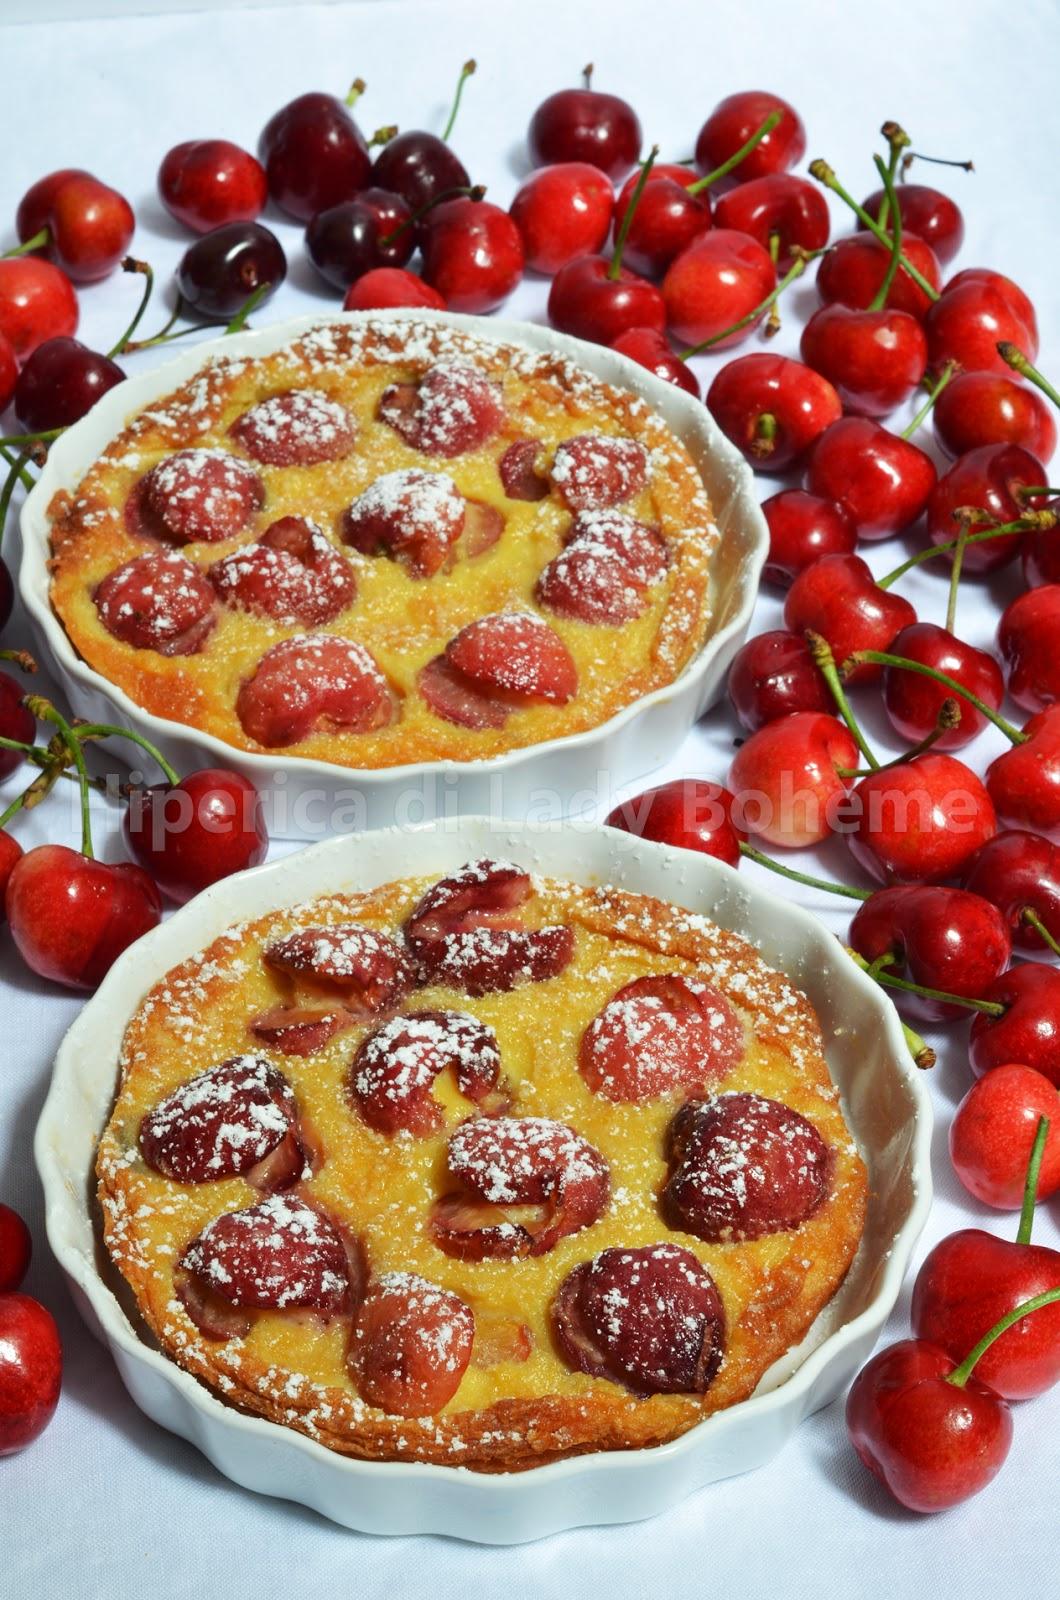 hiperica_lady_boheme_blog_di_cucina_ricette_gustose_facili_veloci_clafoutis_alle_ciliegie_1